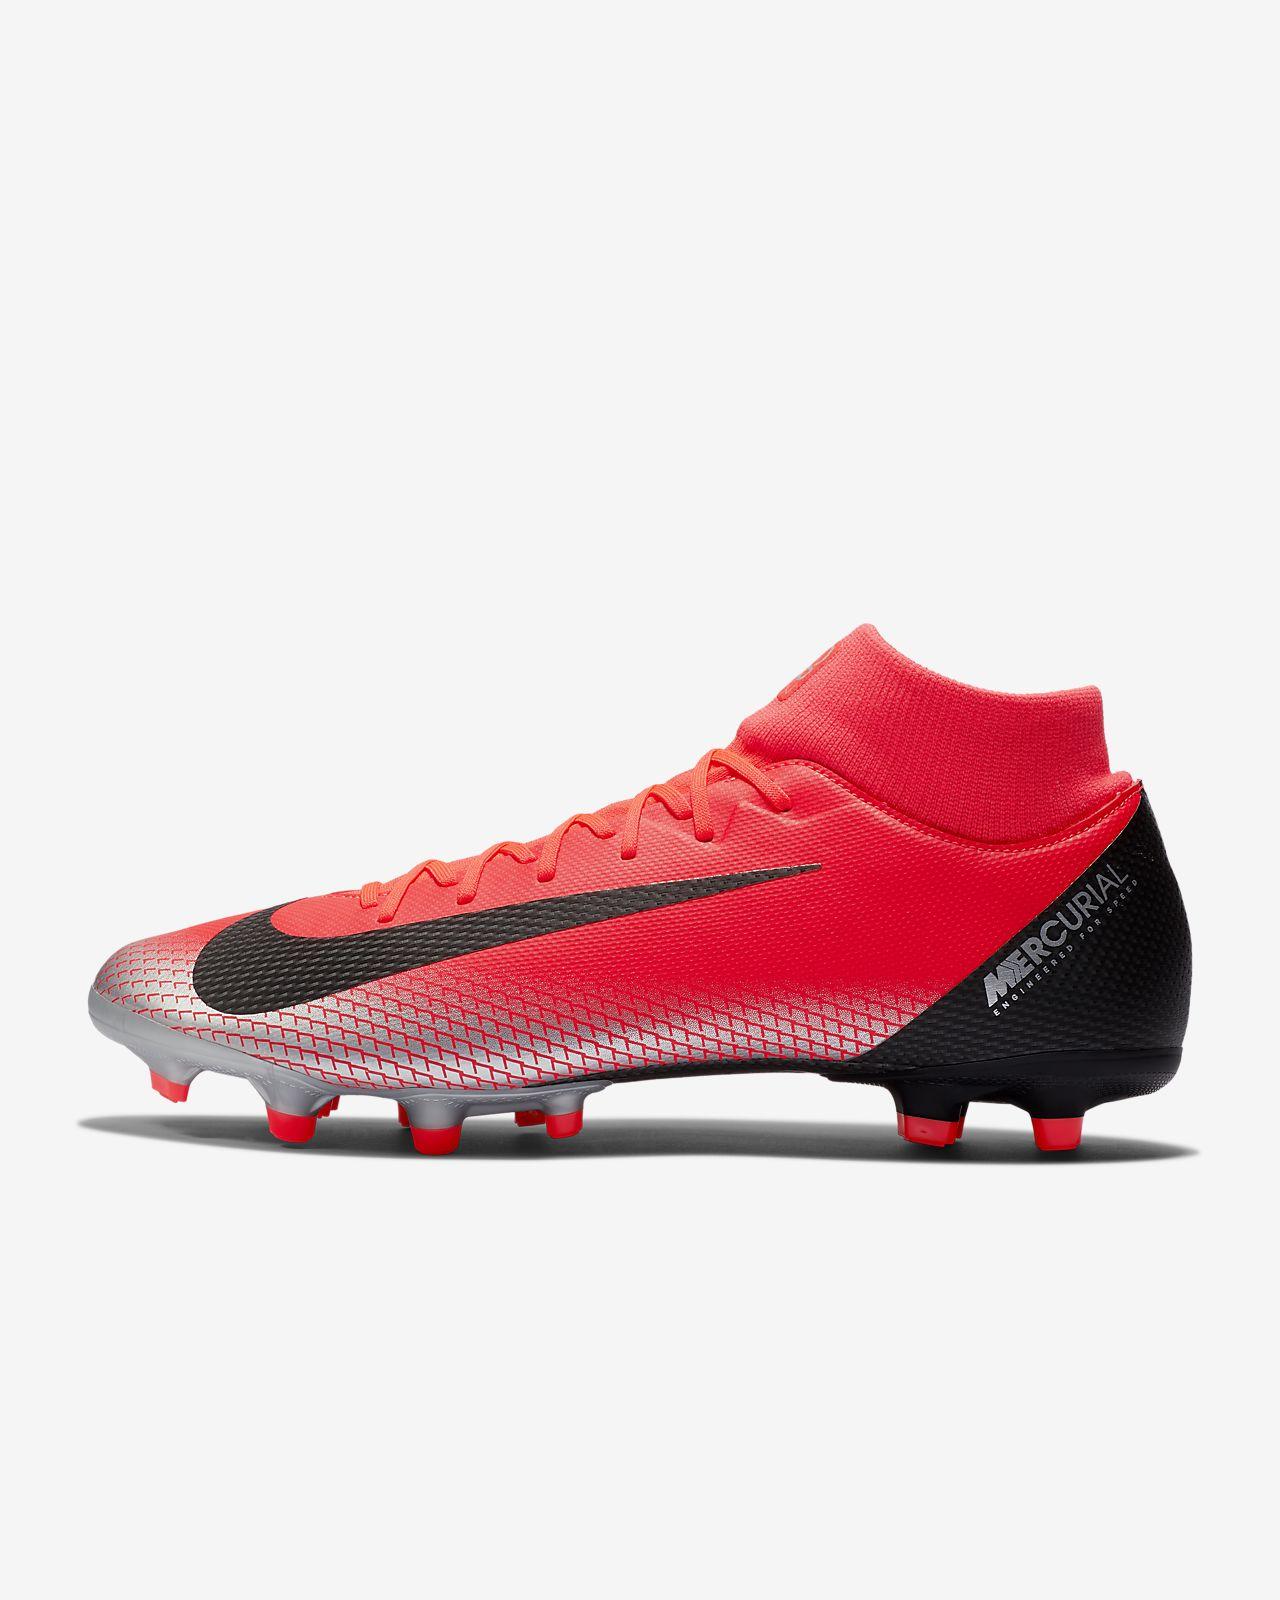 173762bed Acquista scarpe nike mercurial da calcio - OFF30% sconti